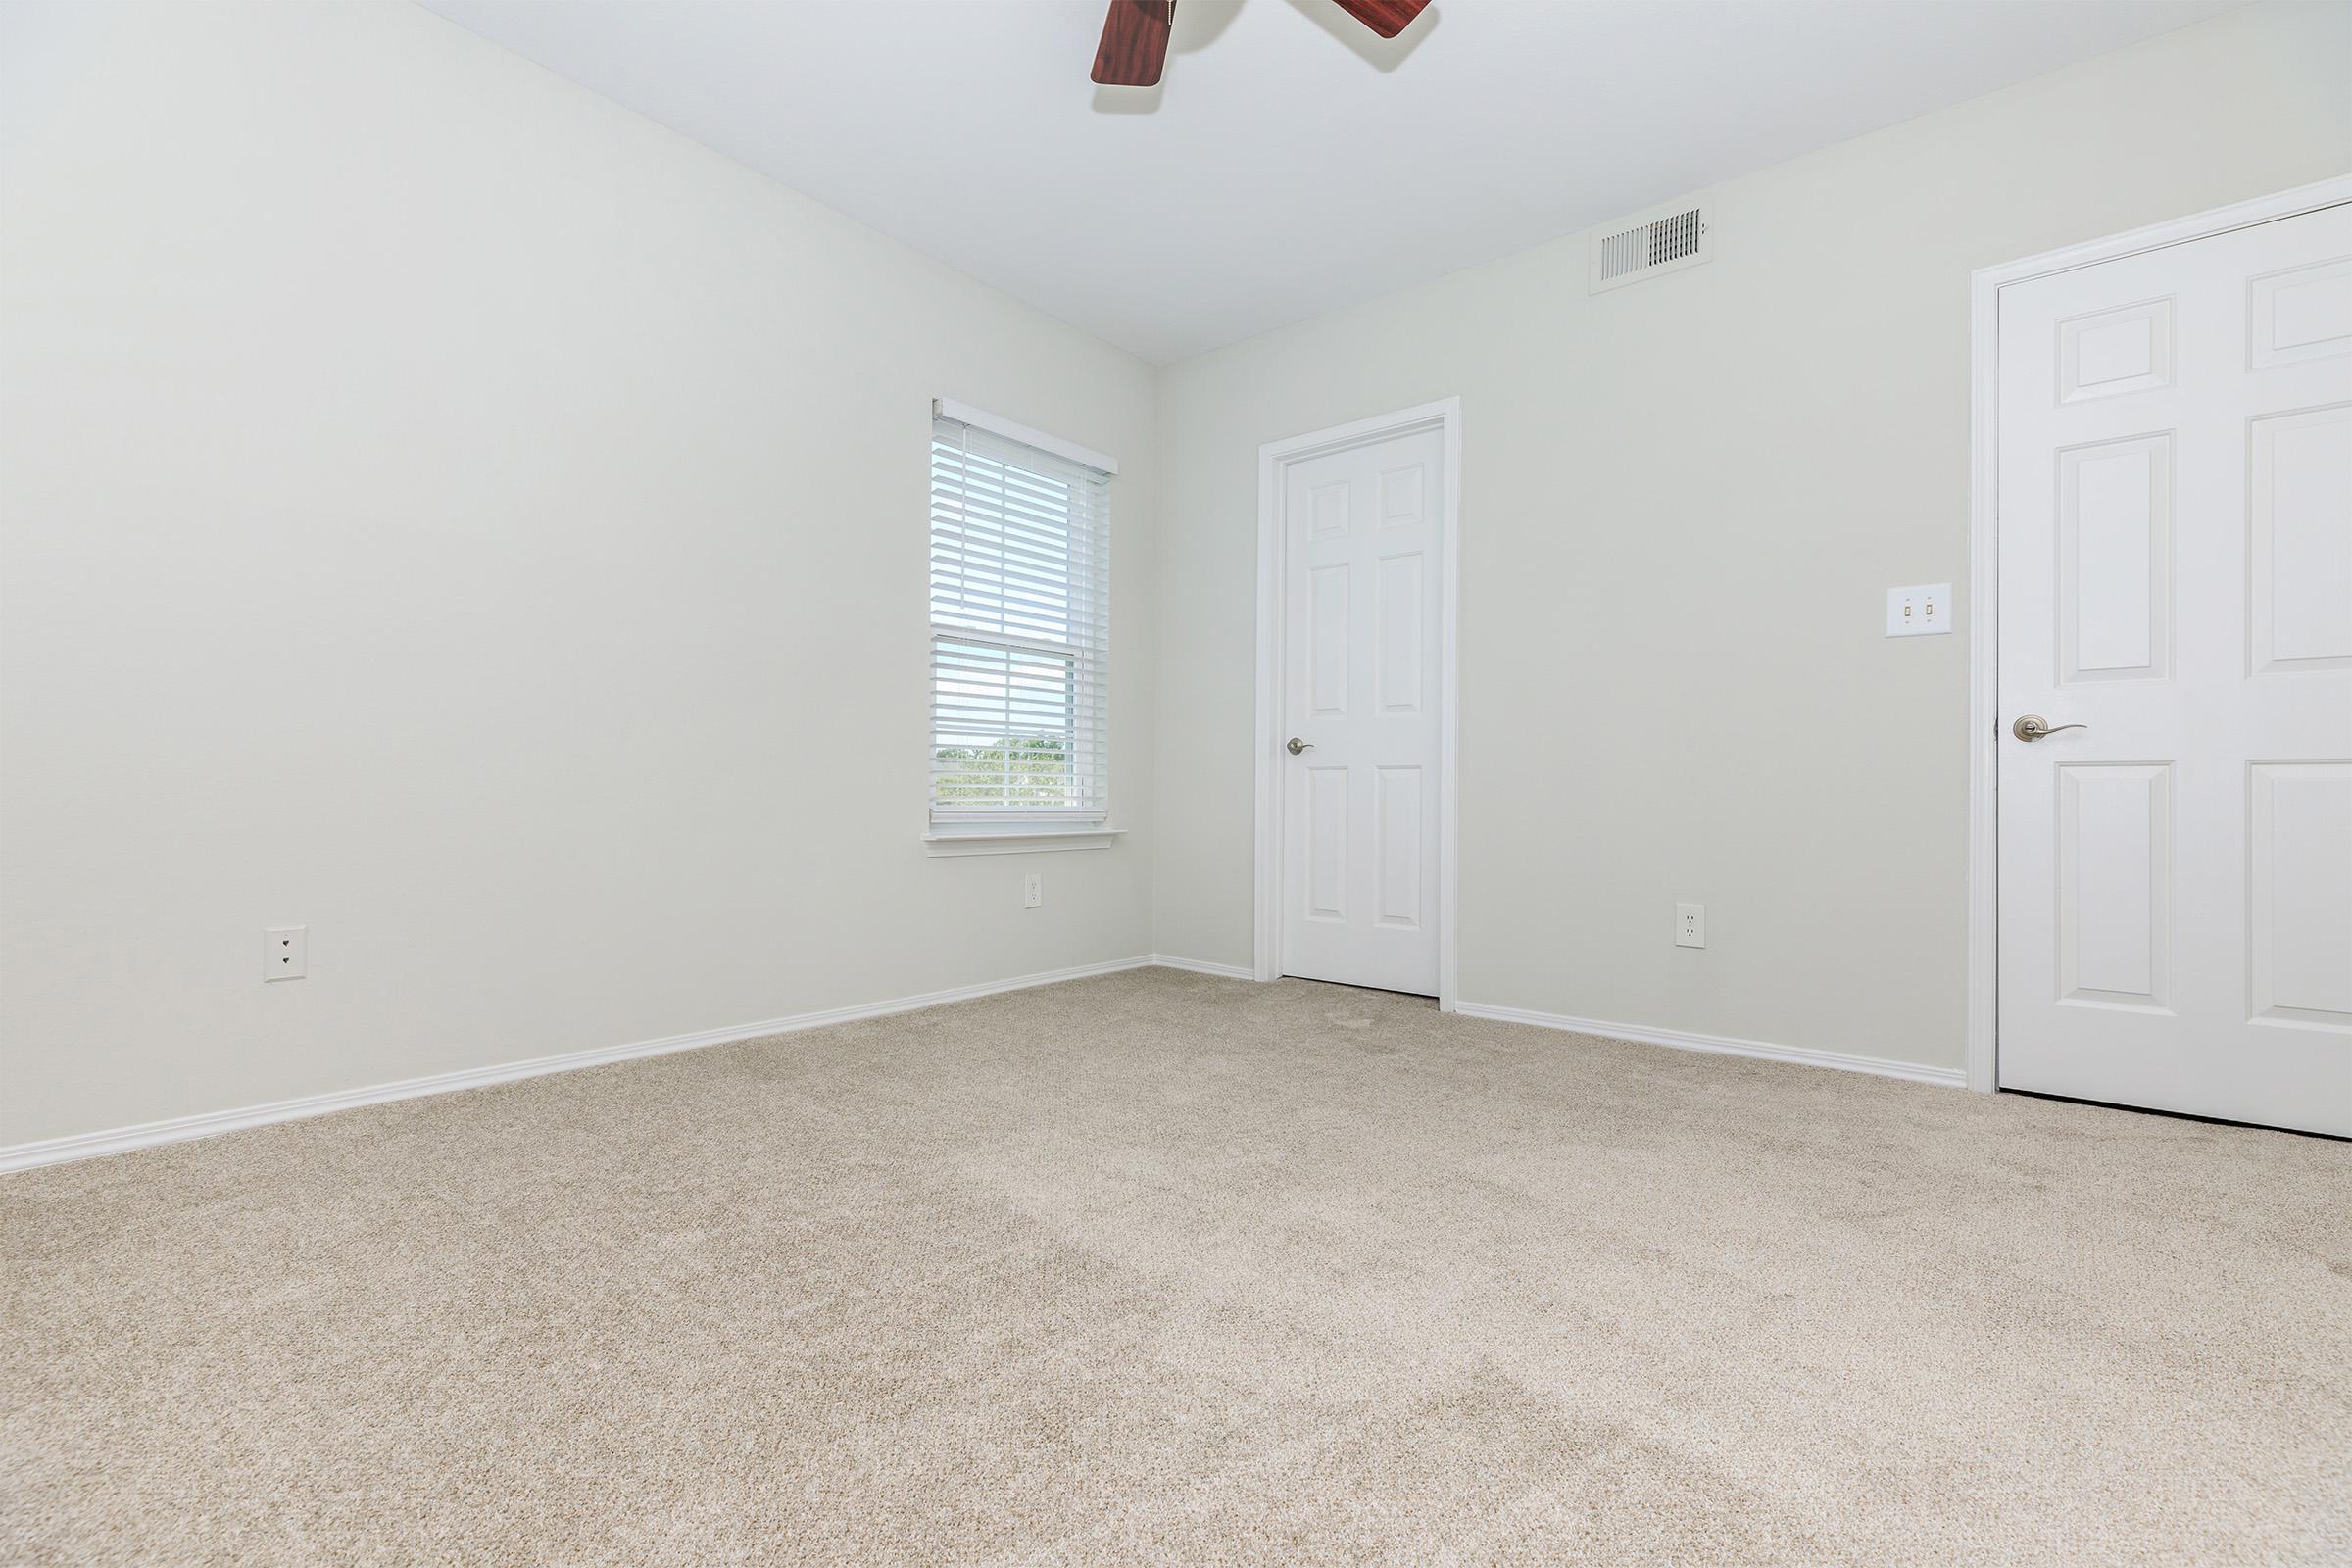 Room at The Ridgeleigh at Van Dorn in Alexandria, VA